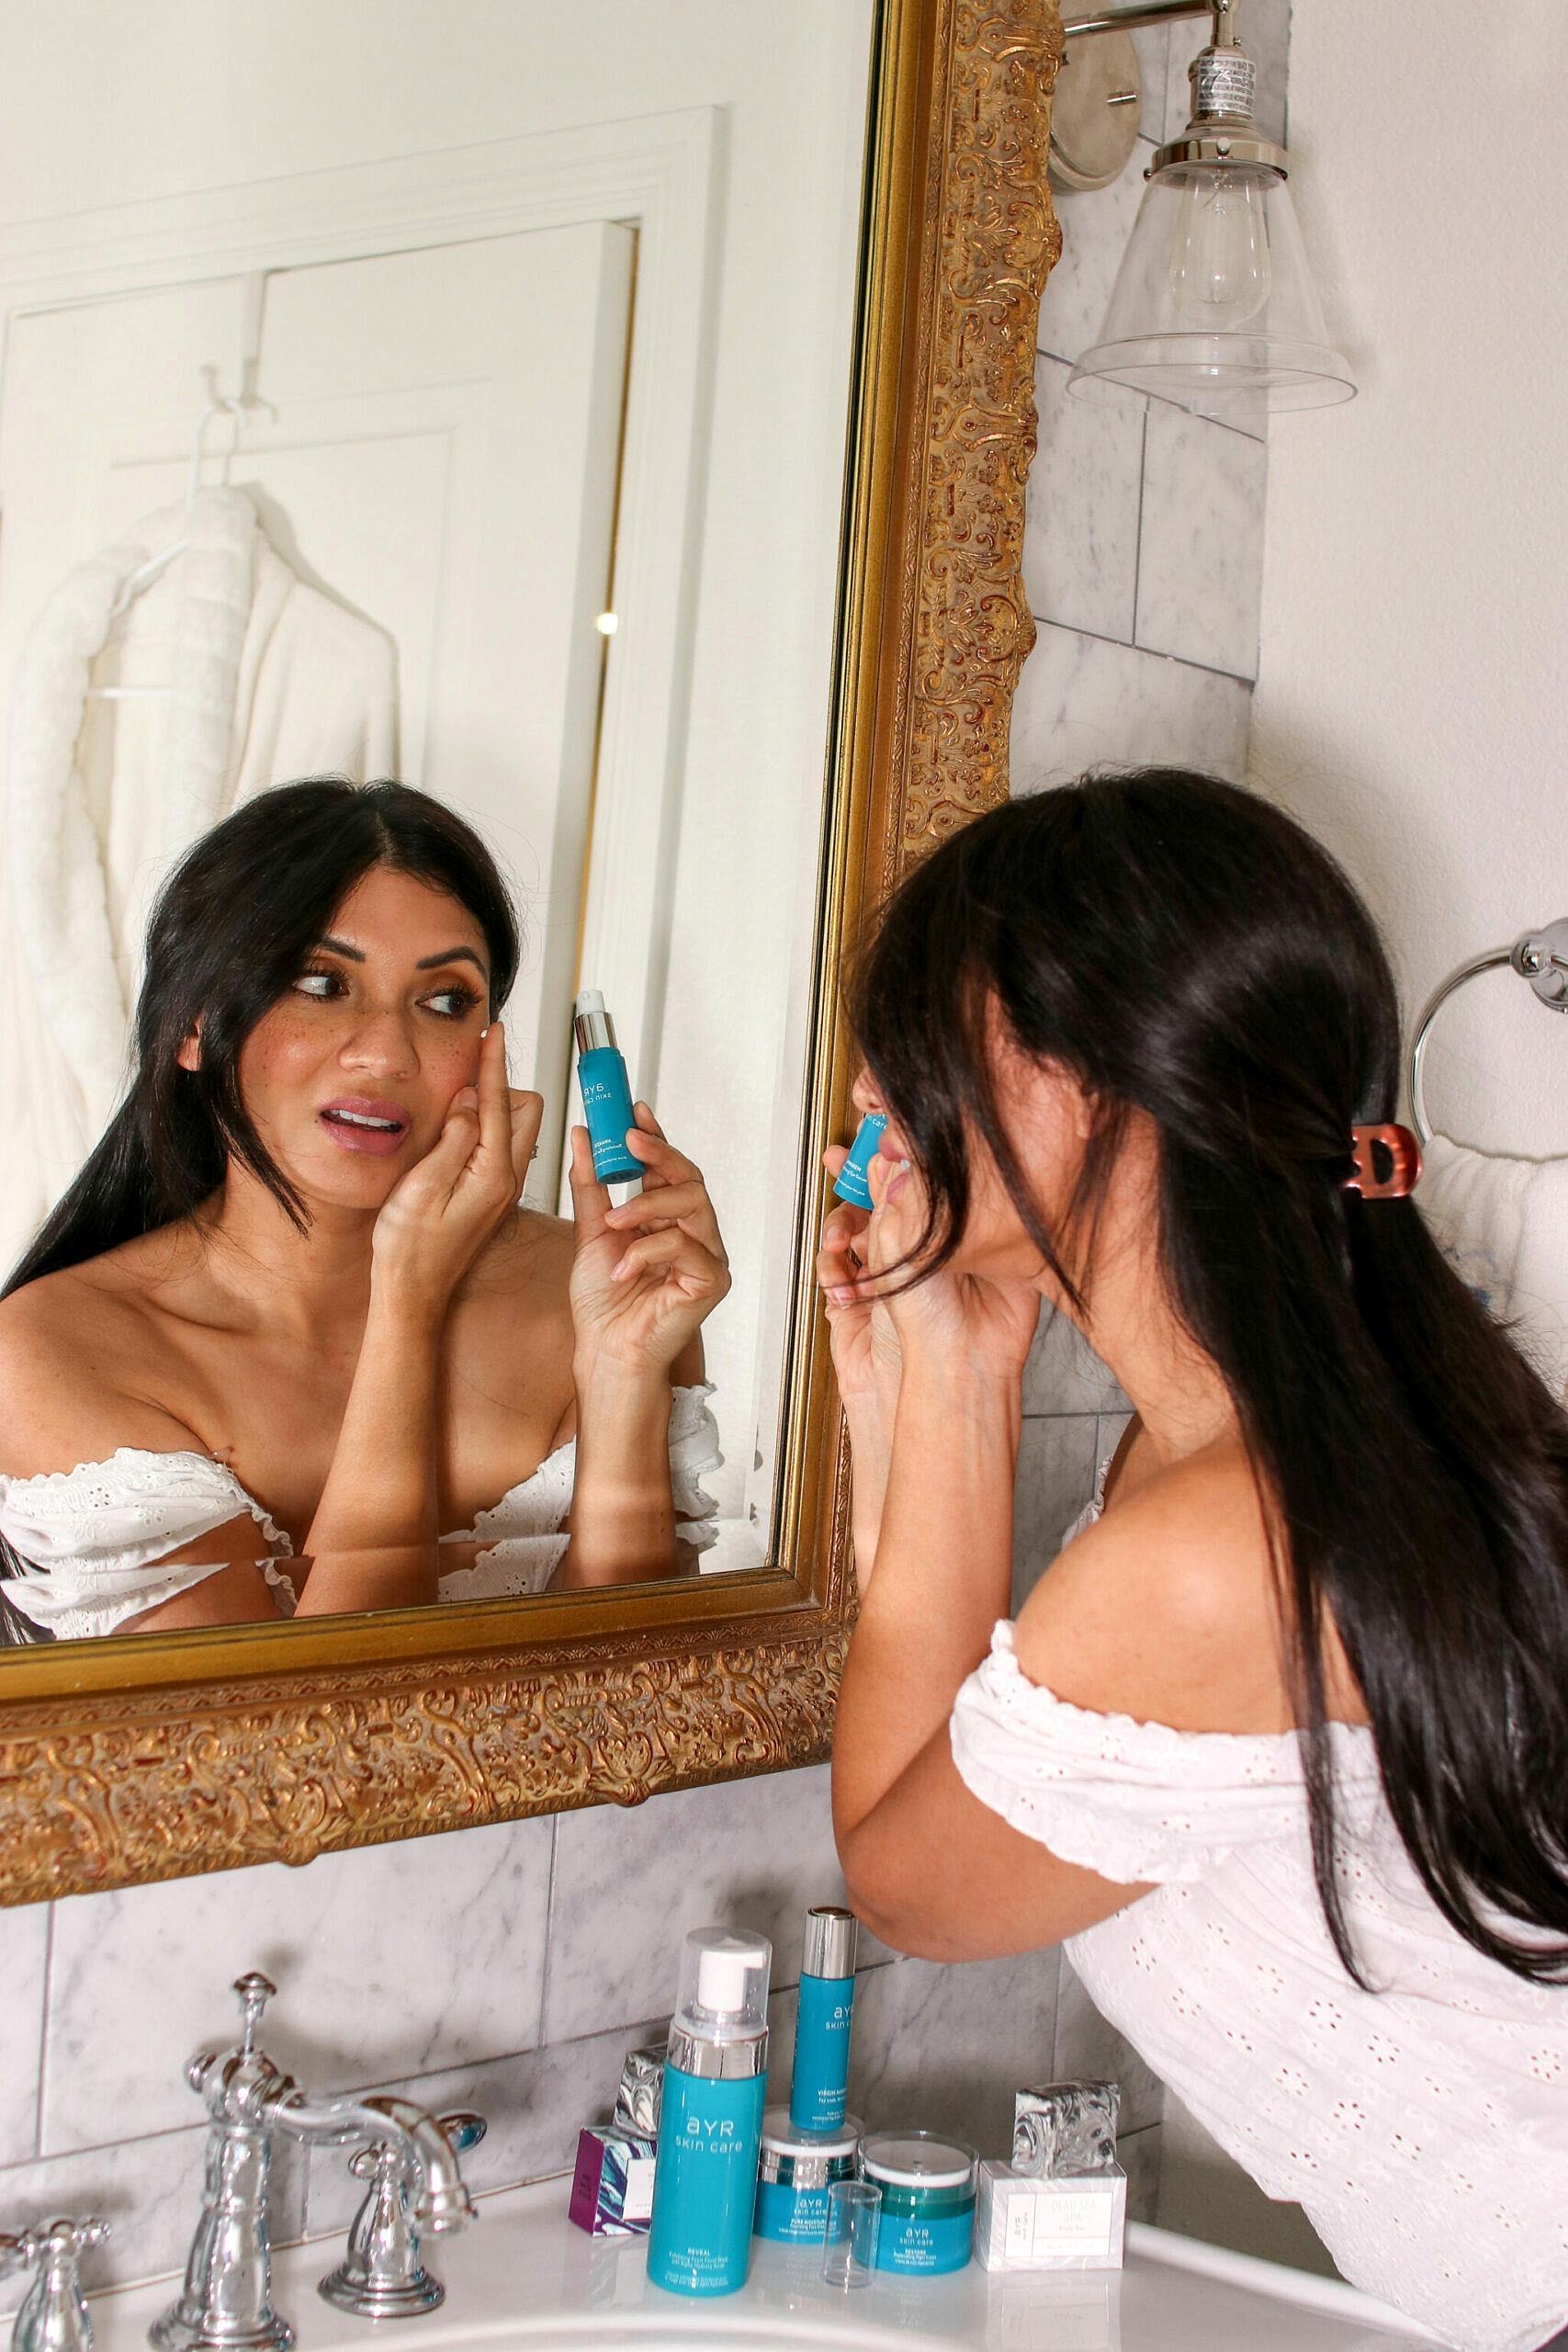 AYR Skincare Products | Organic and Carefully Sourced Natural Ingredients | Awaken Revitalizing Eye Serum